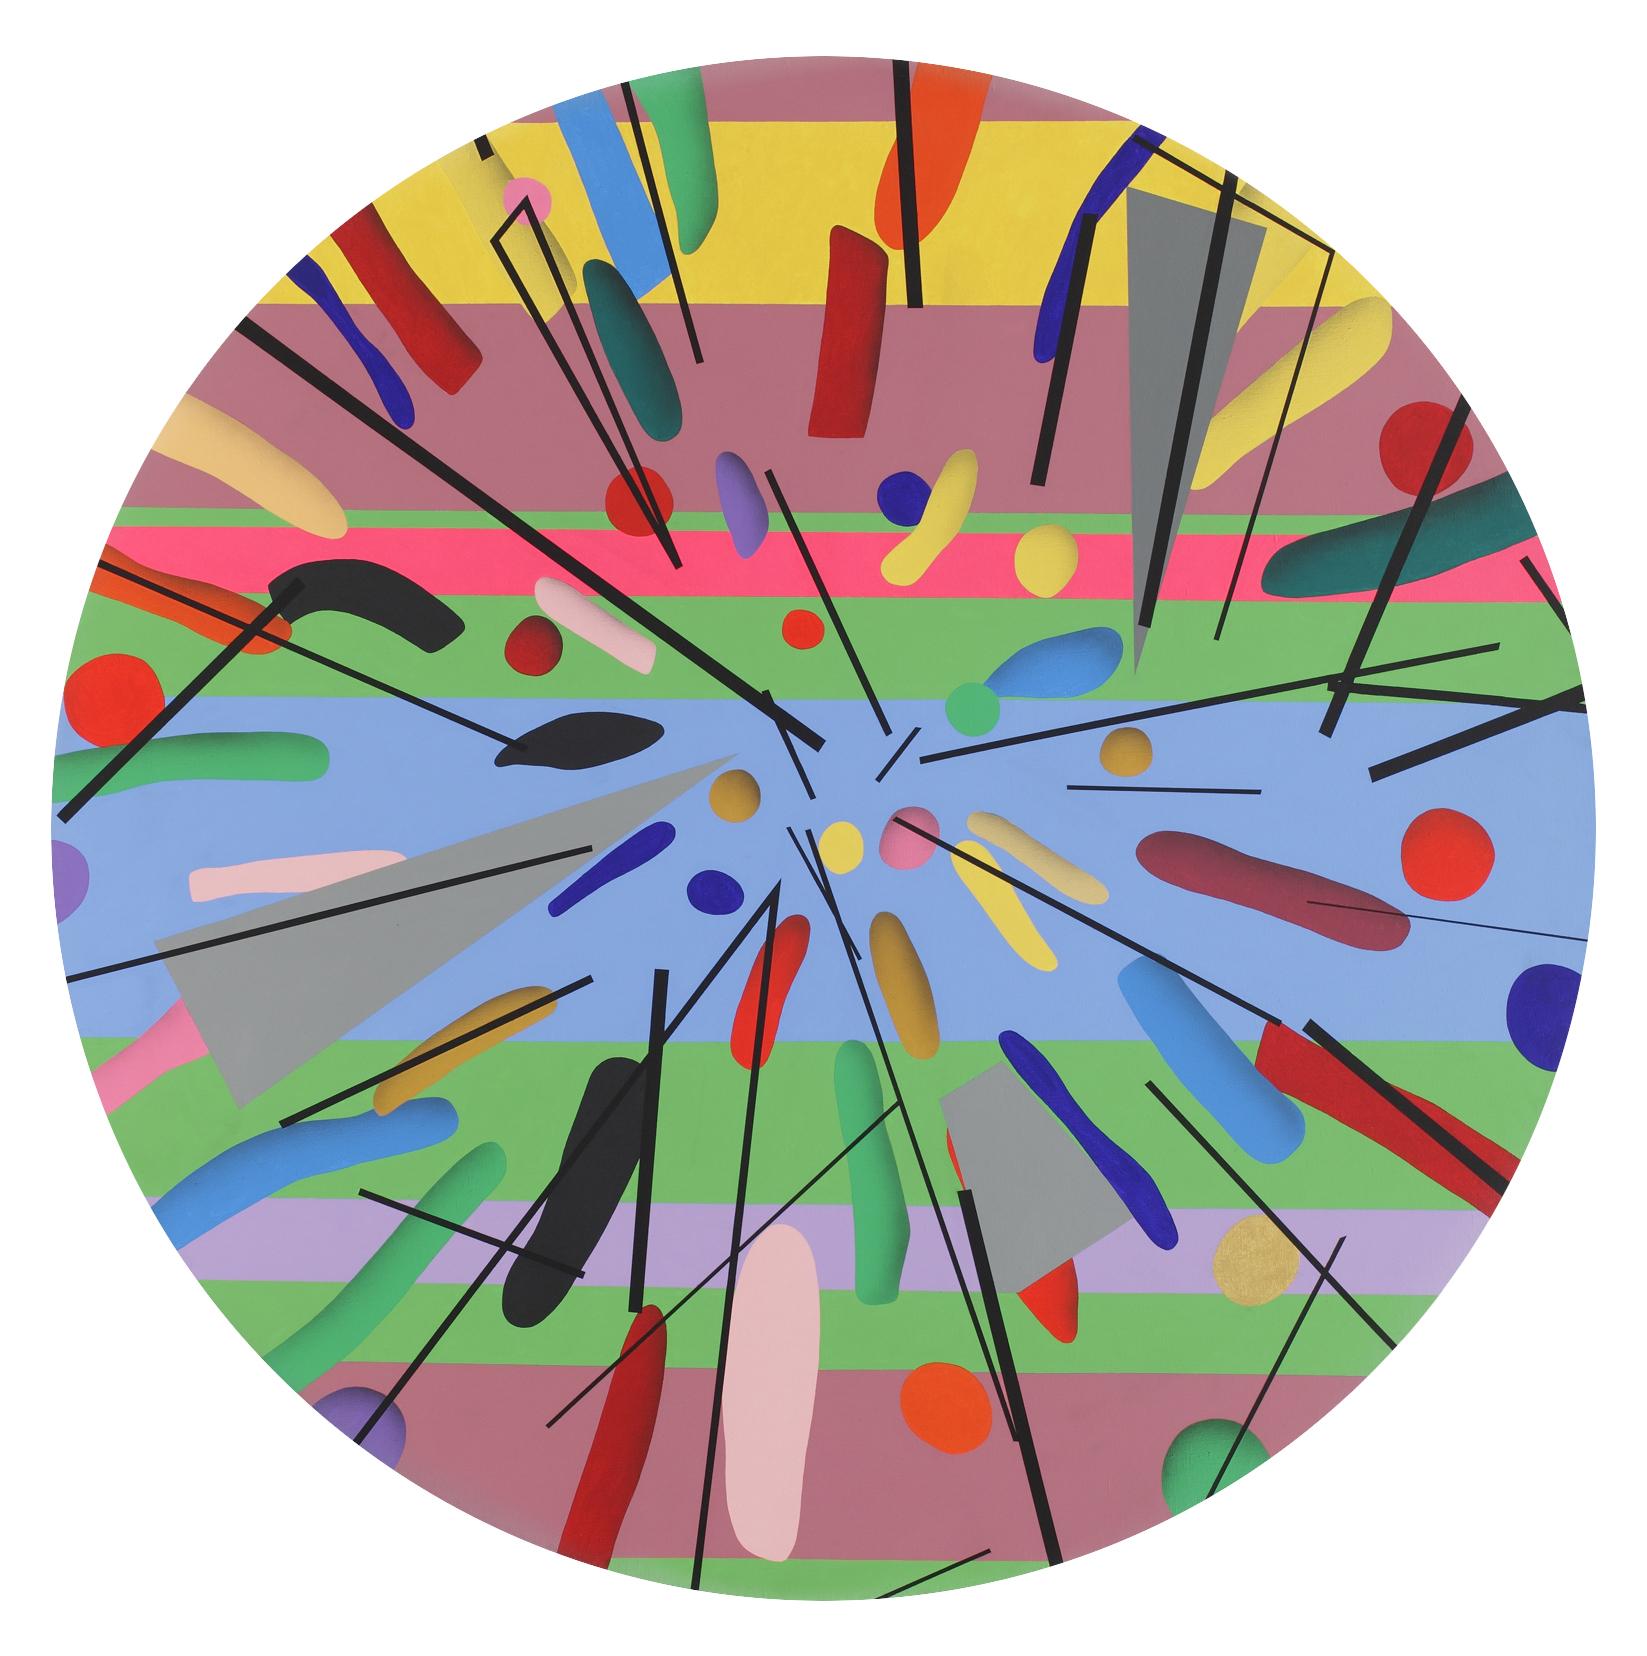 Mandala No. 14 /Horizontal/ 2011, acrylic on canvas, 180 x 180 cm